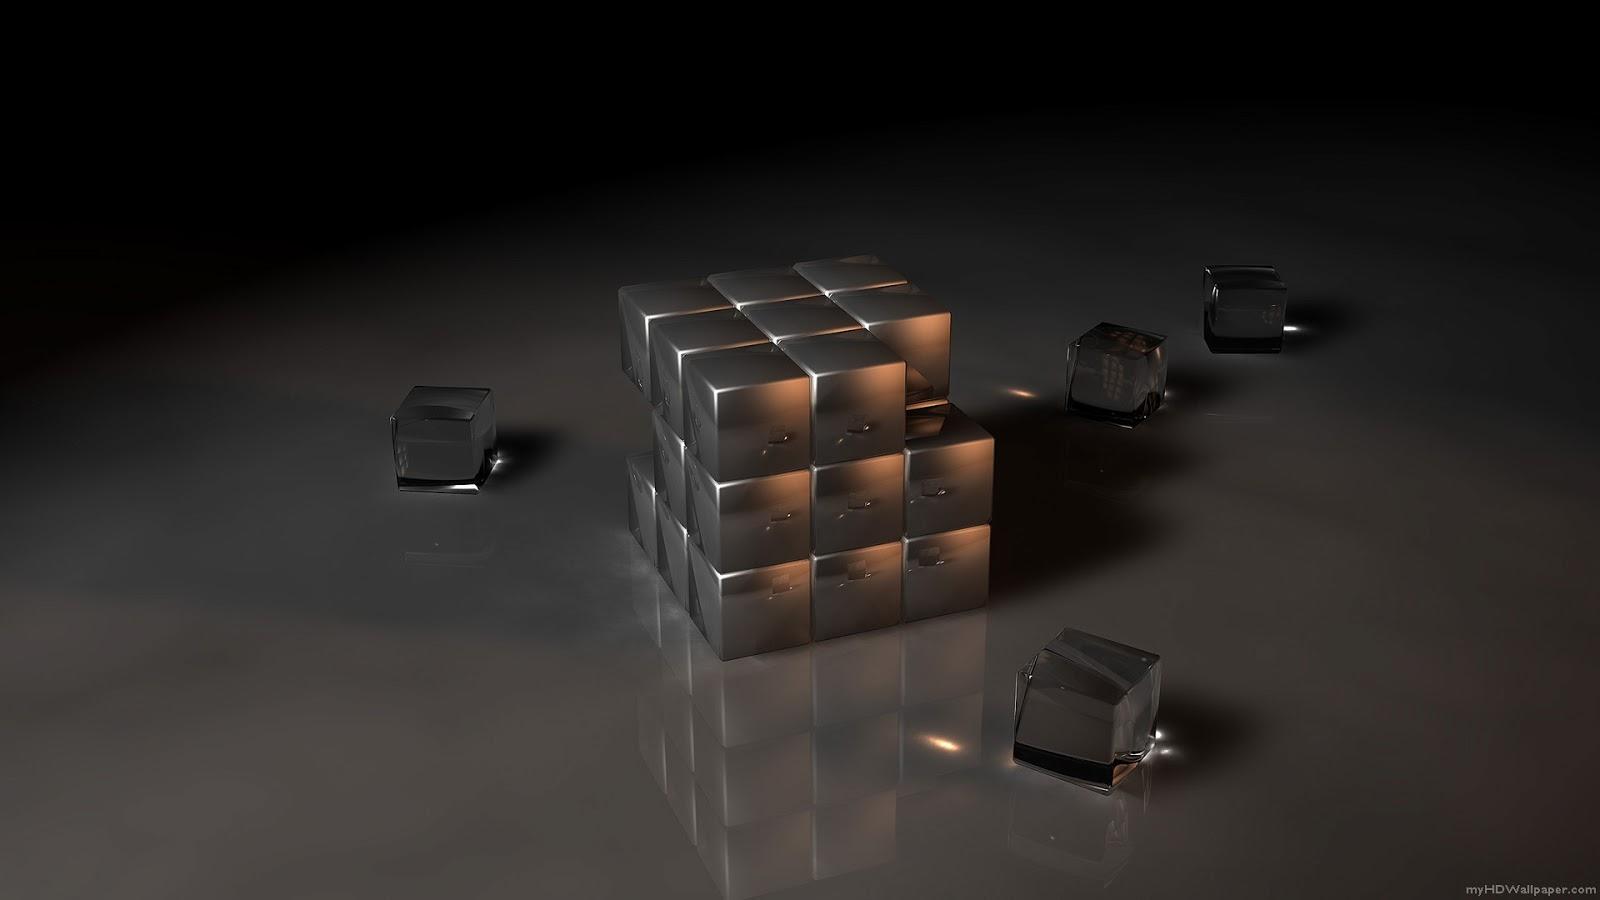 Gambar Gambar Keren 3D Wallpaper